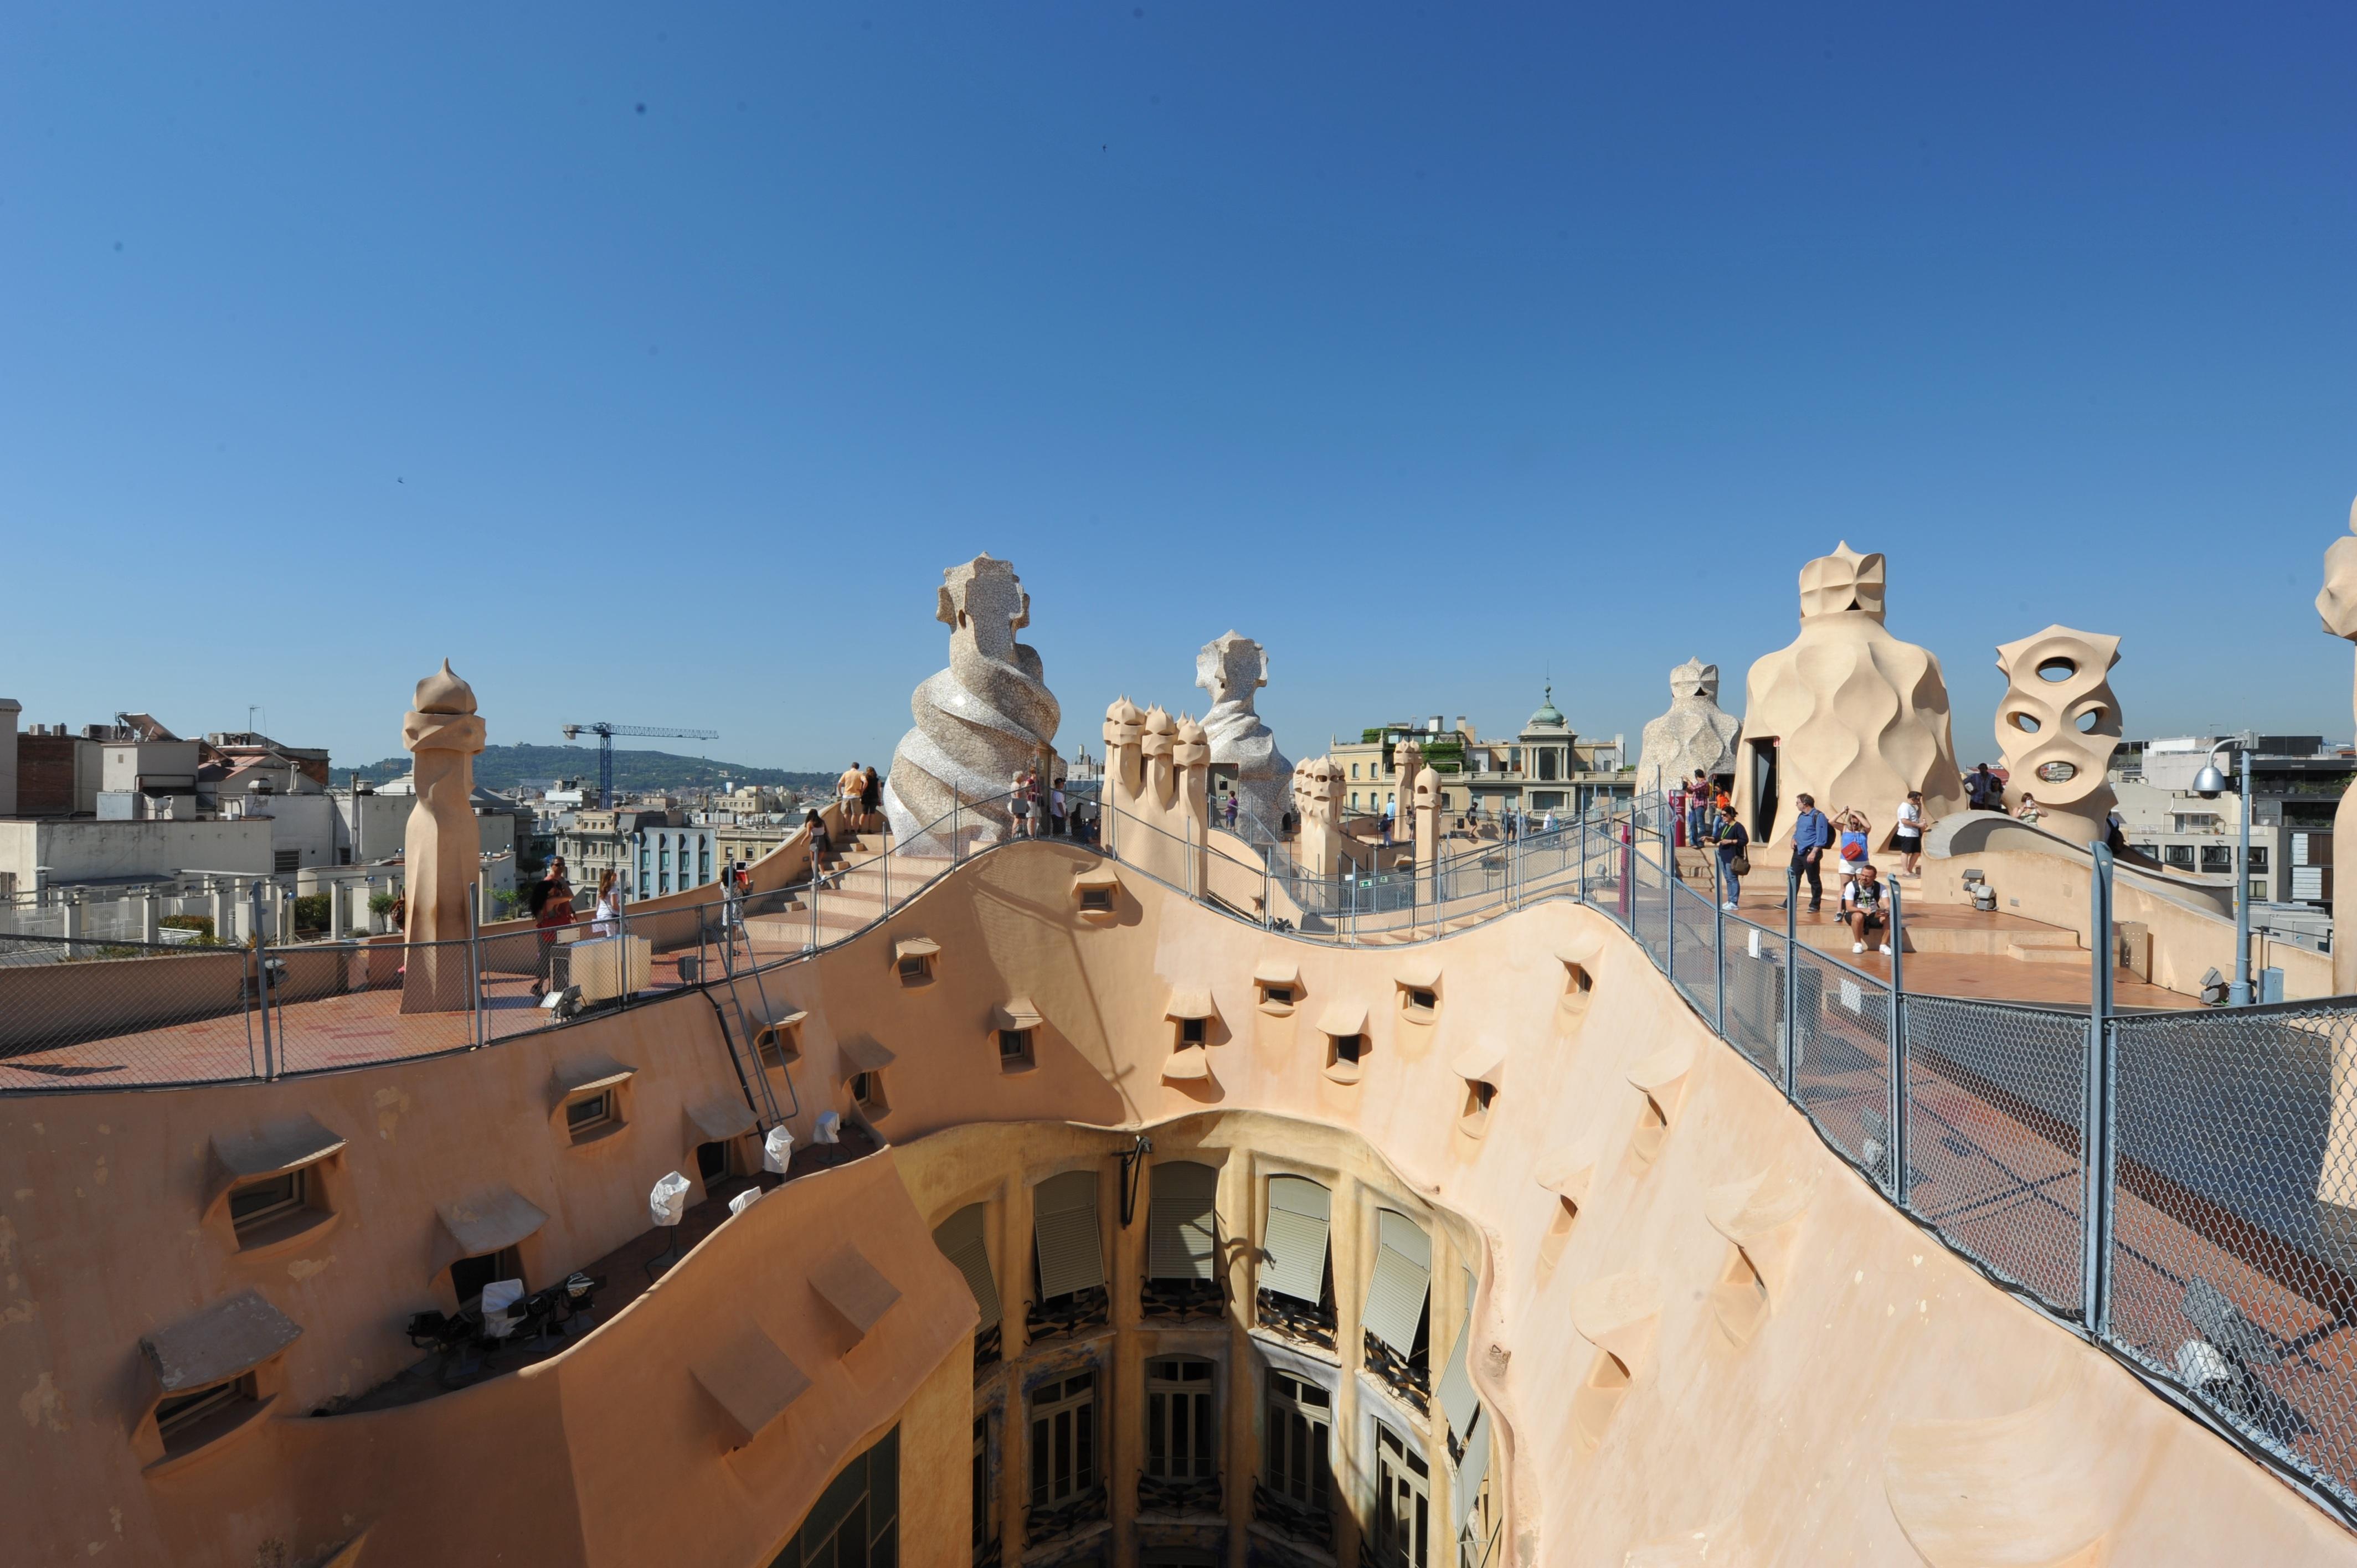 Fotos Gratis Arquitectura Pueblo Edificio Monumento